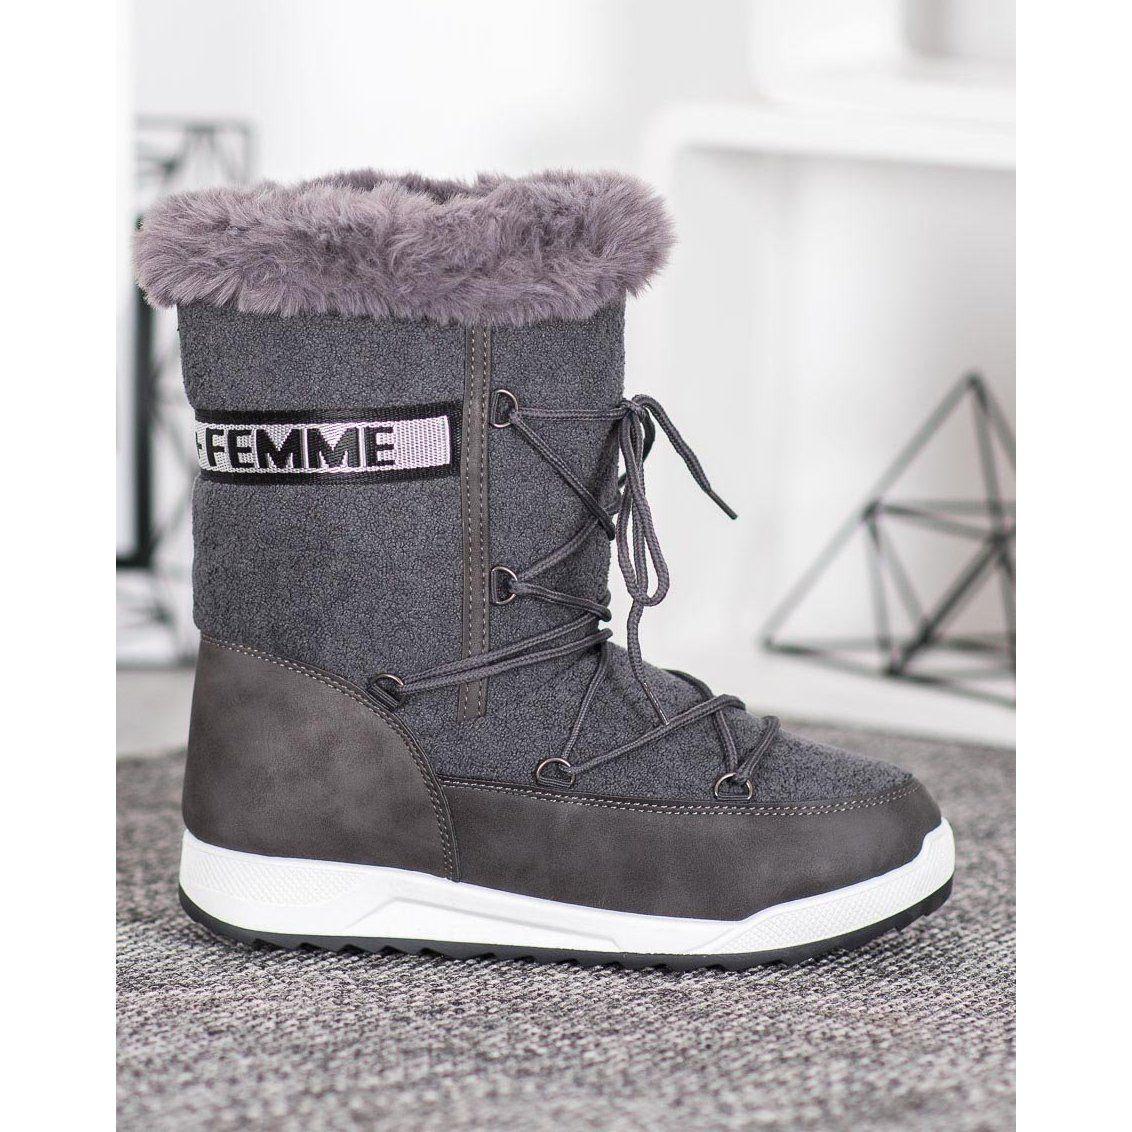 Small Swan Sznurowane Sniegowce Fashion Szare Fashion Boots Ugg Boots